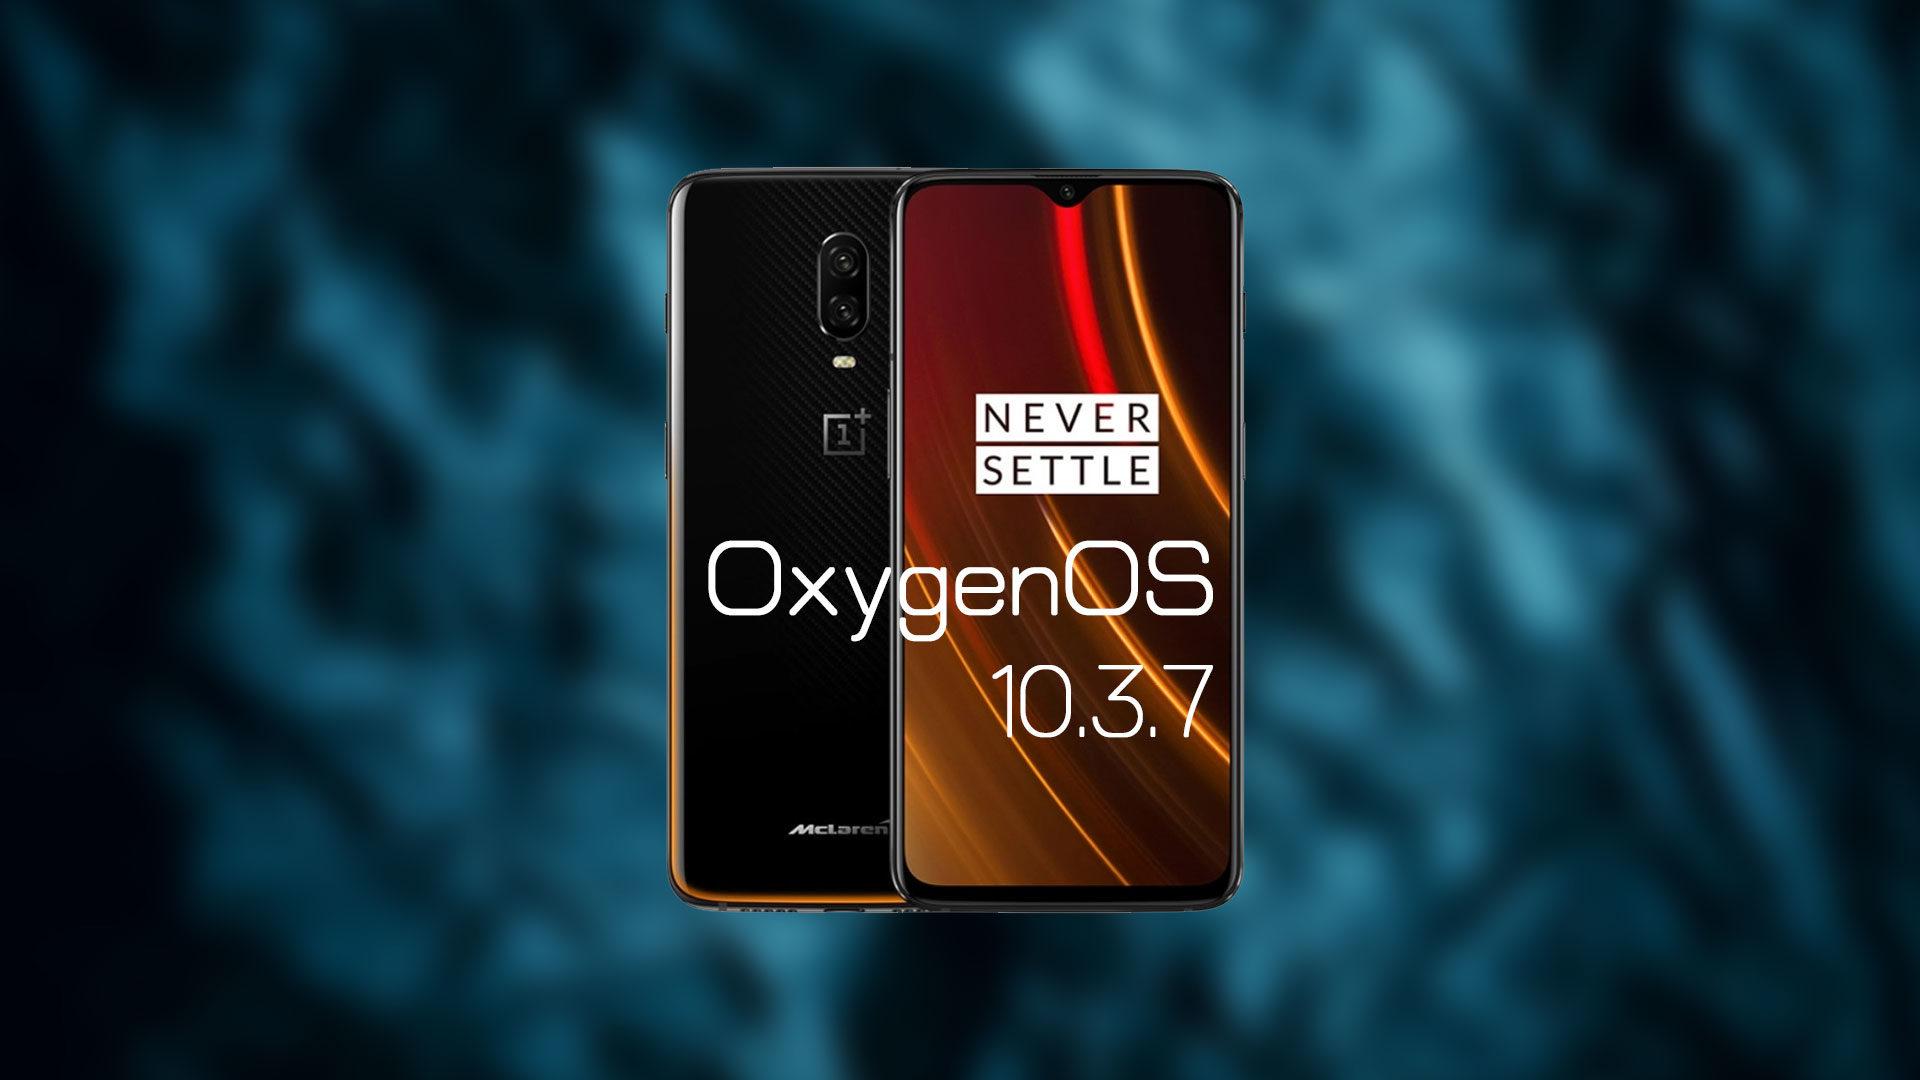 「OnePlus 6/6T」向けにスクリーンショットの不具合修正や誤タッチ防止機能の追加を含む「OxygenOS 10.3.7」がリリース